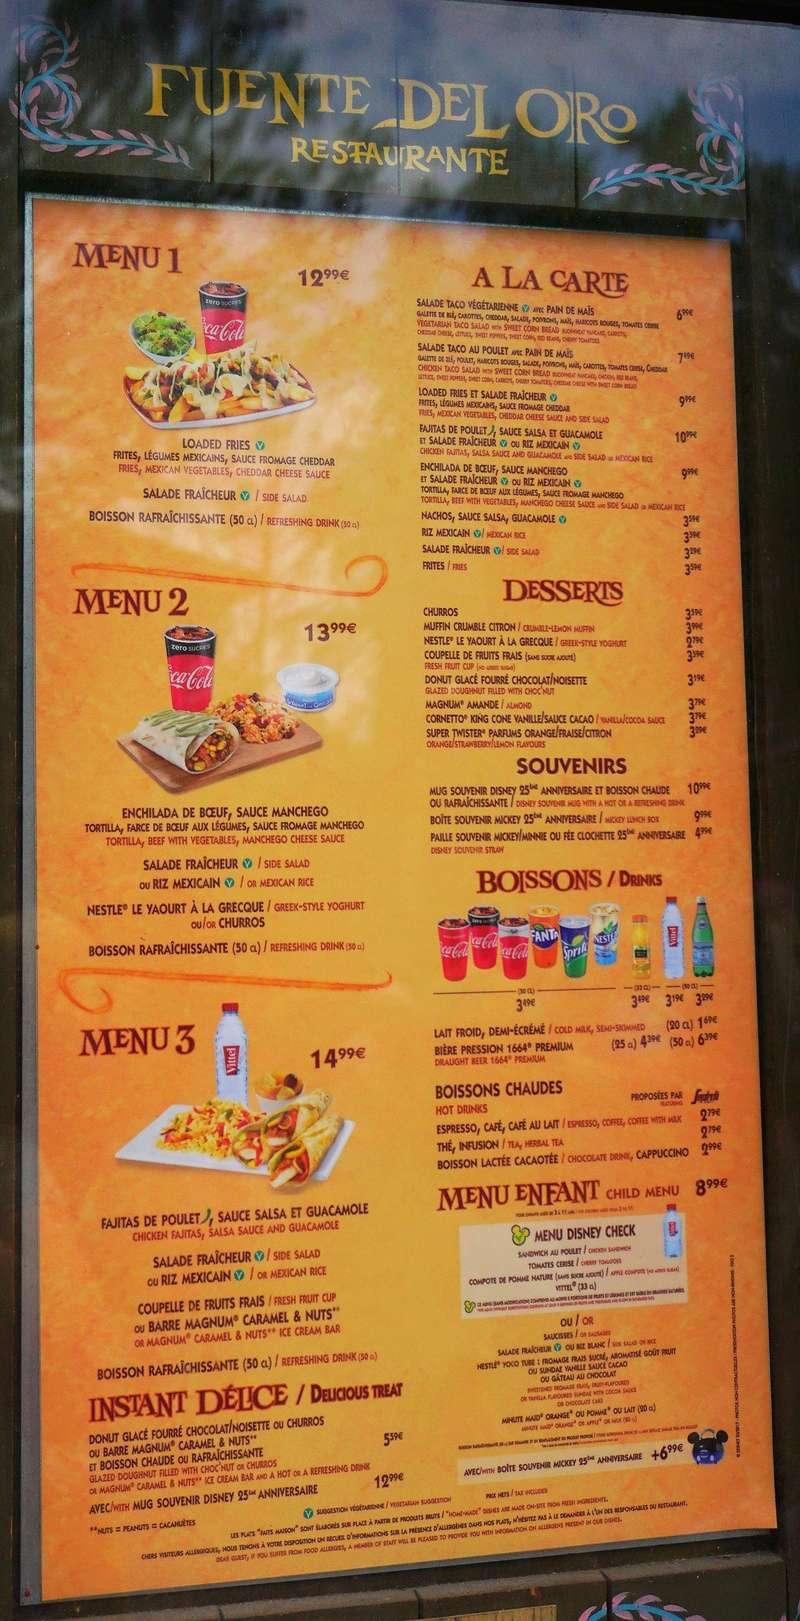 Fuente del Oro Restaurante (carte p.9) - Page 8 Dsc02110